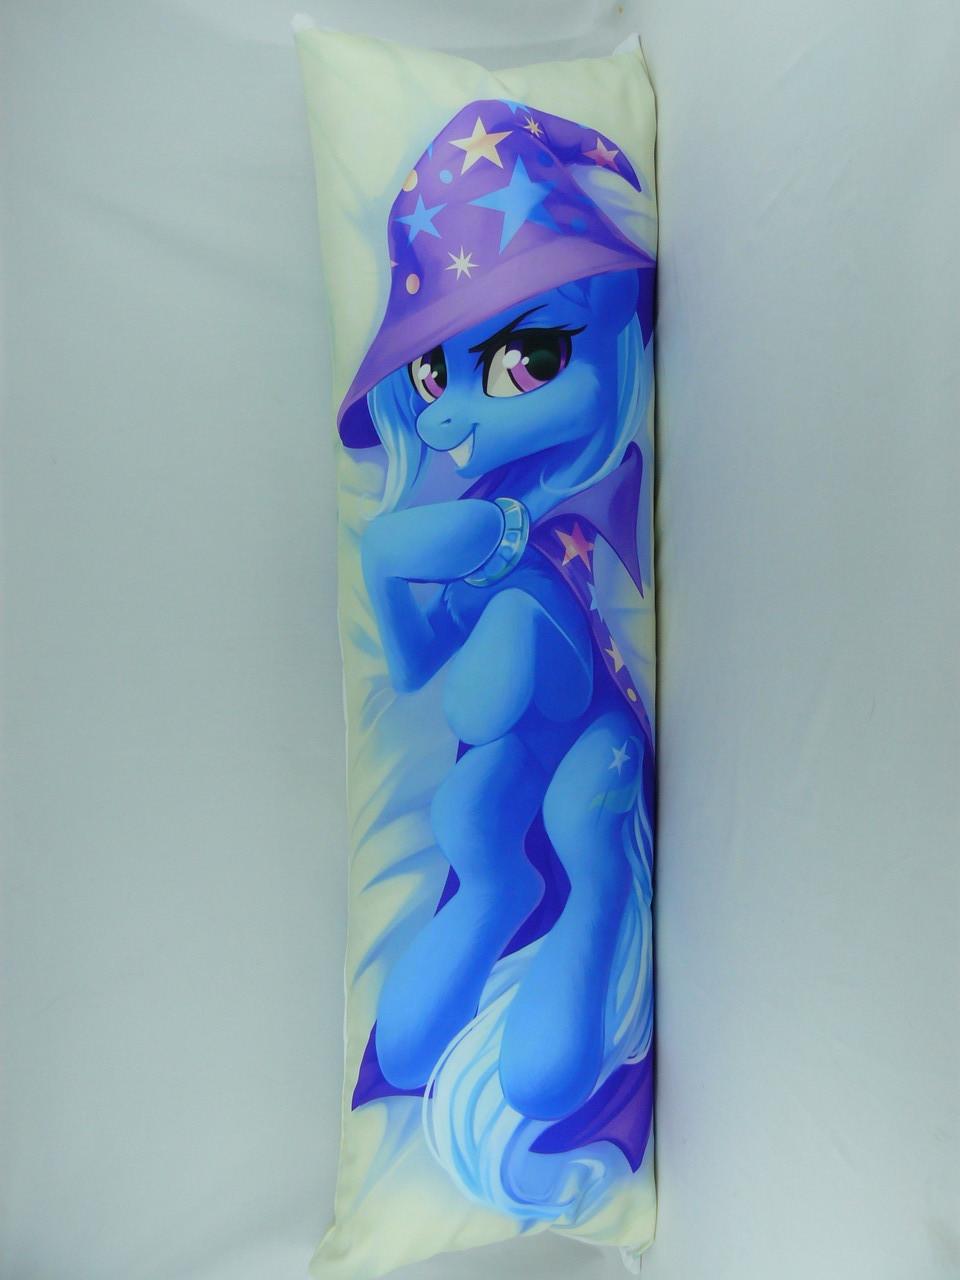 Подушка для обнимания 150 х 50 Трикси ( Trixie ) Дакимакура аниме обнимашка ростовая двухсторонняя